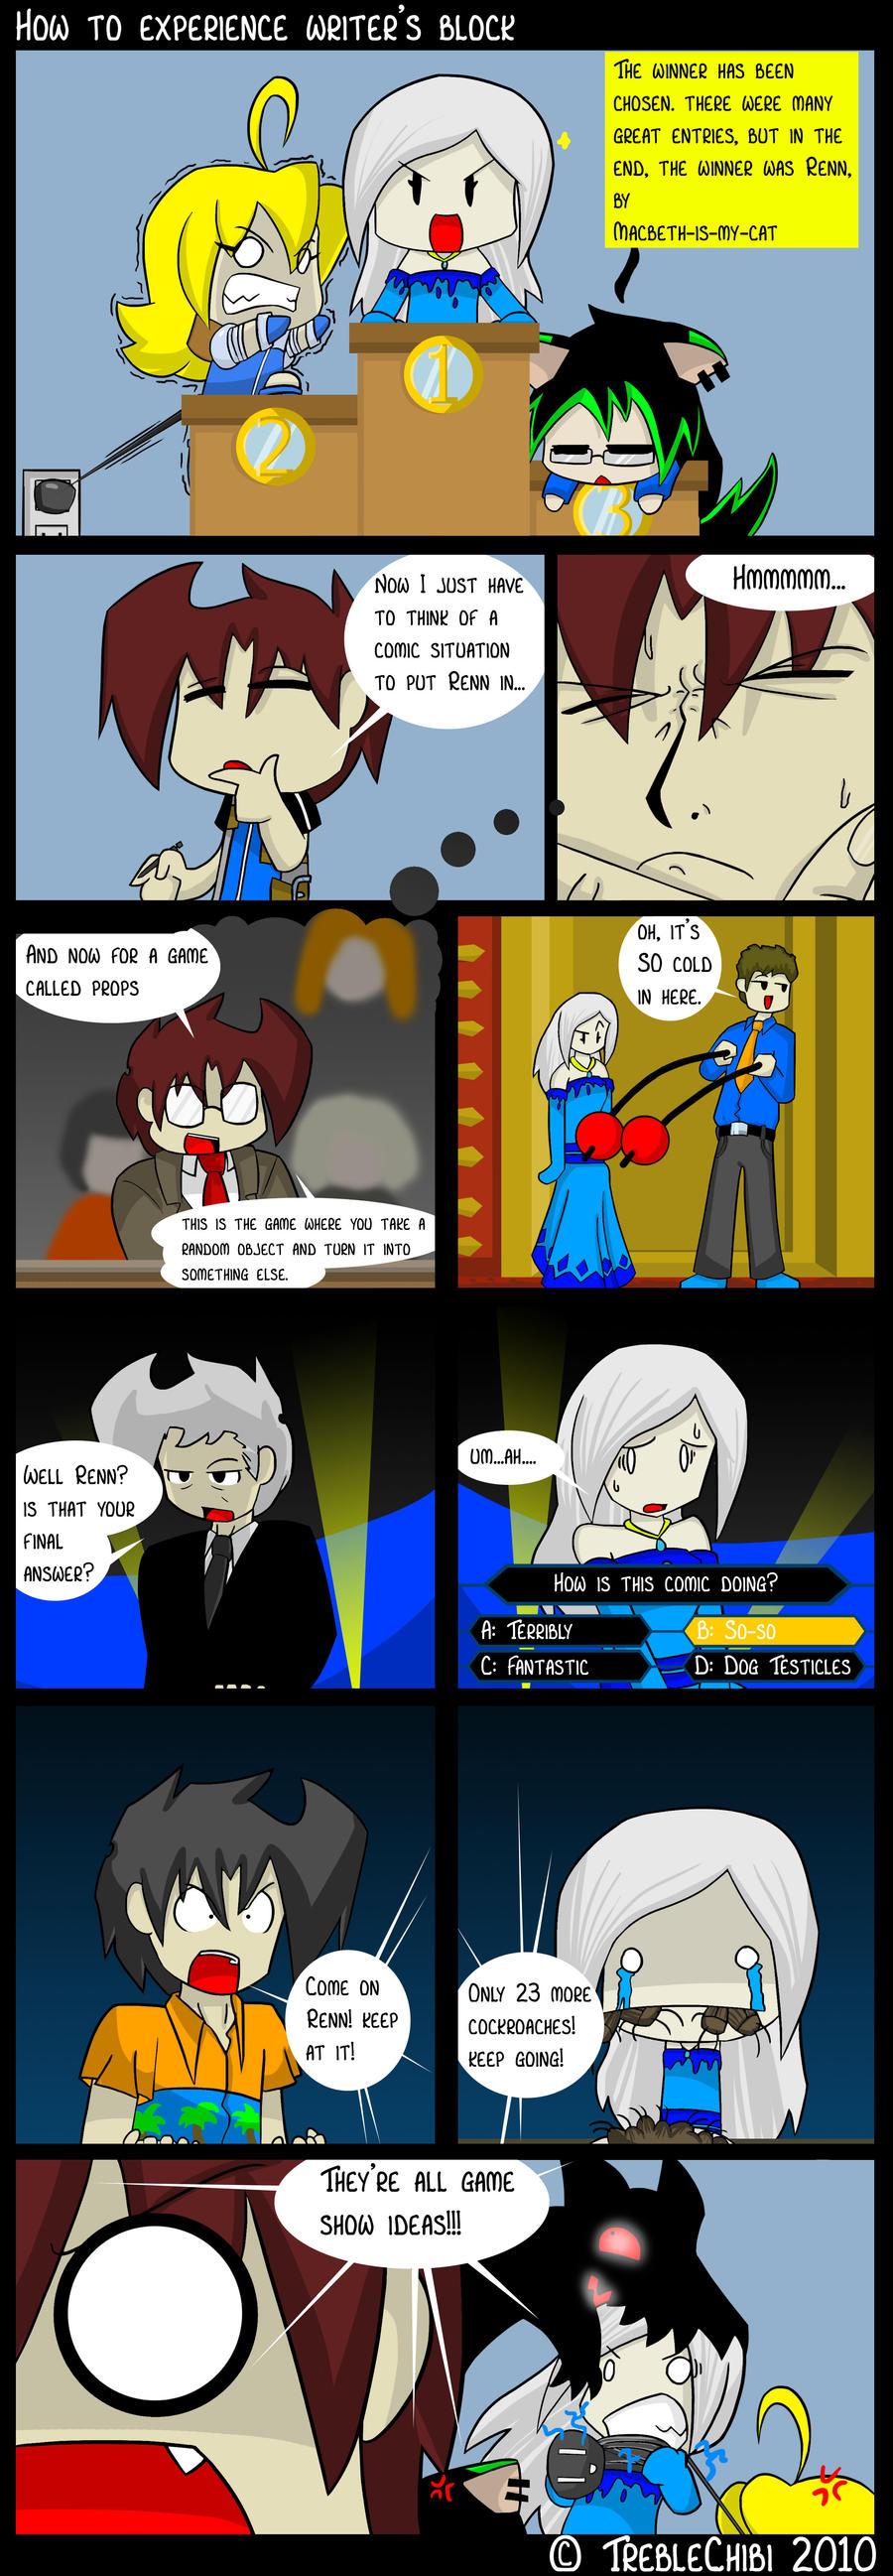 The Winning Comic by DukeStewart